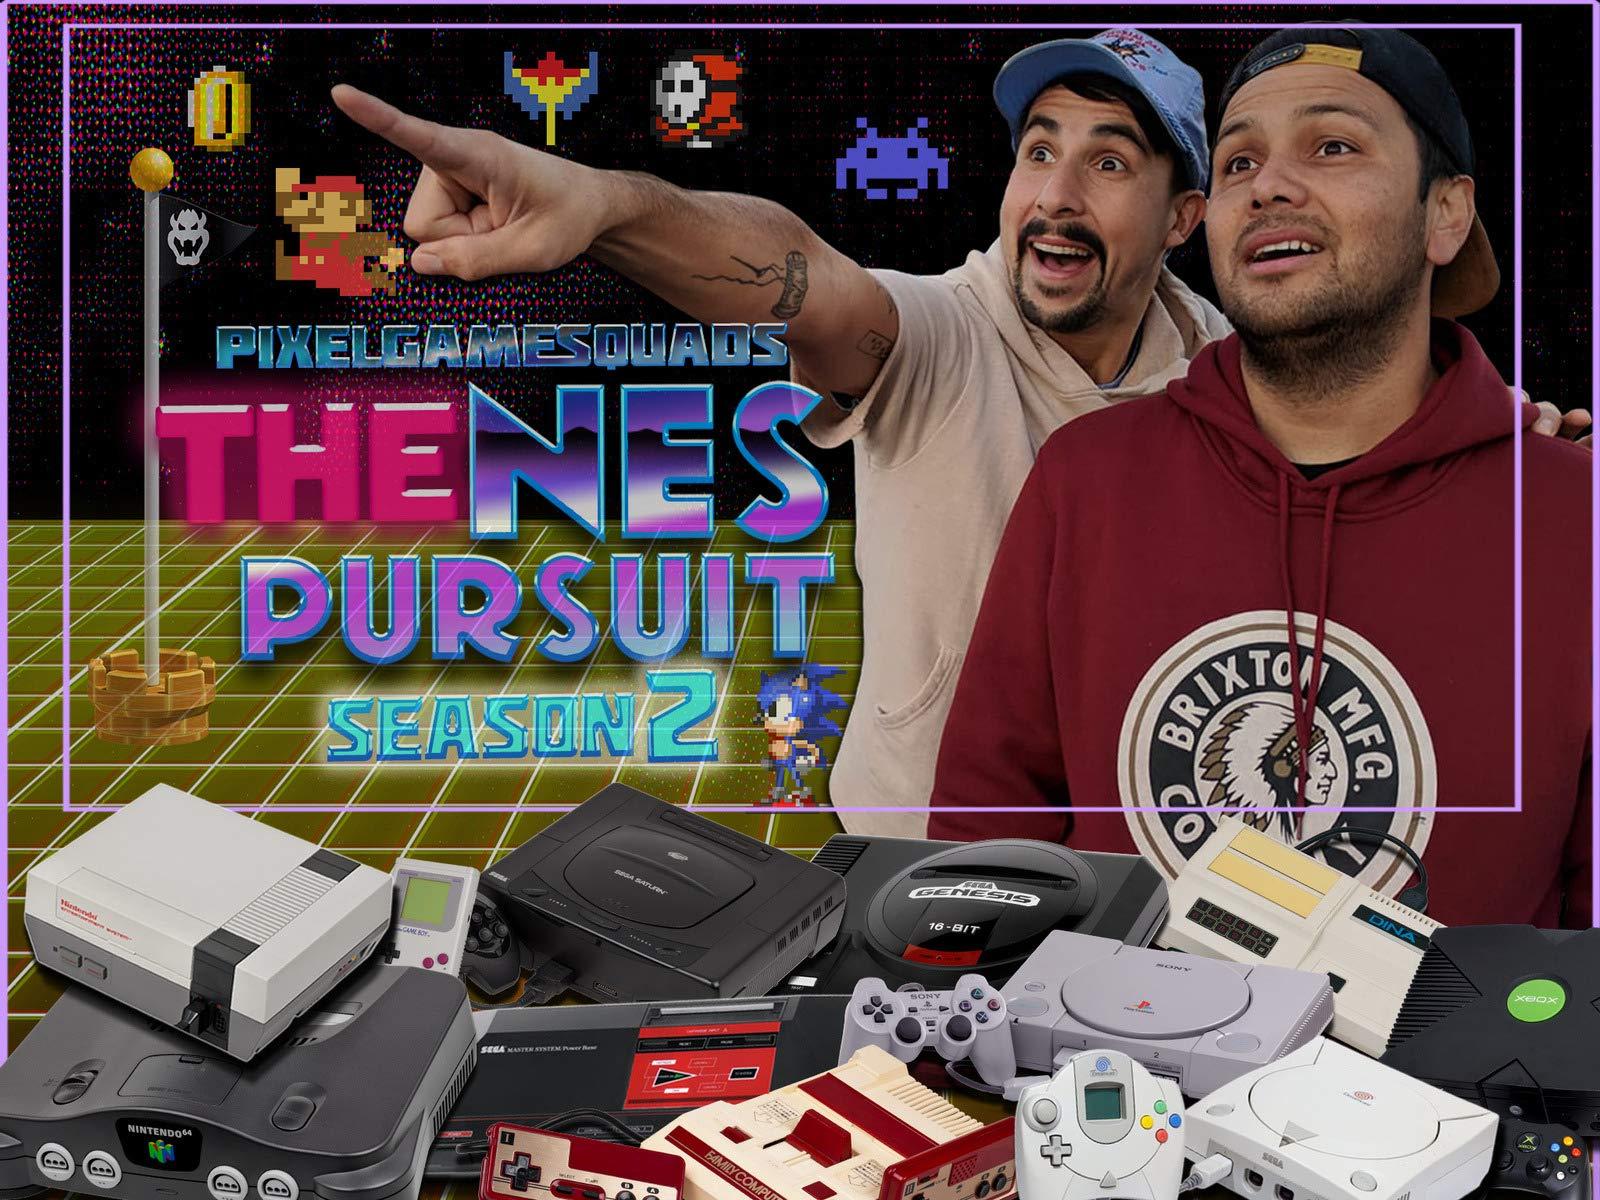 Game Squad's NES Pursuit - Season 2